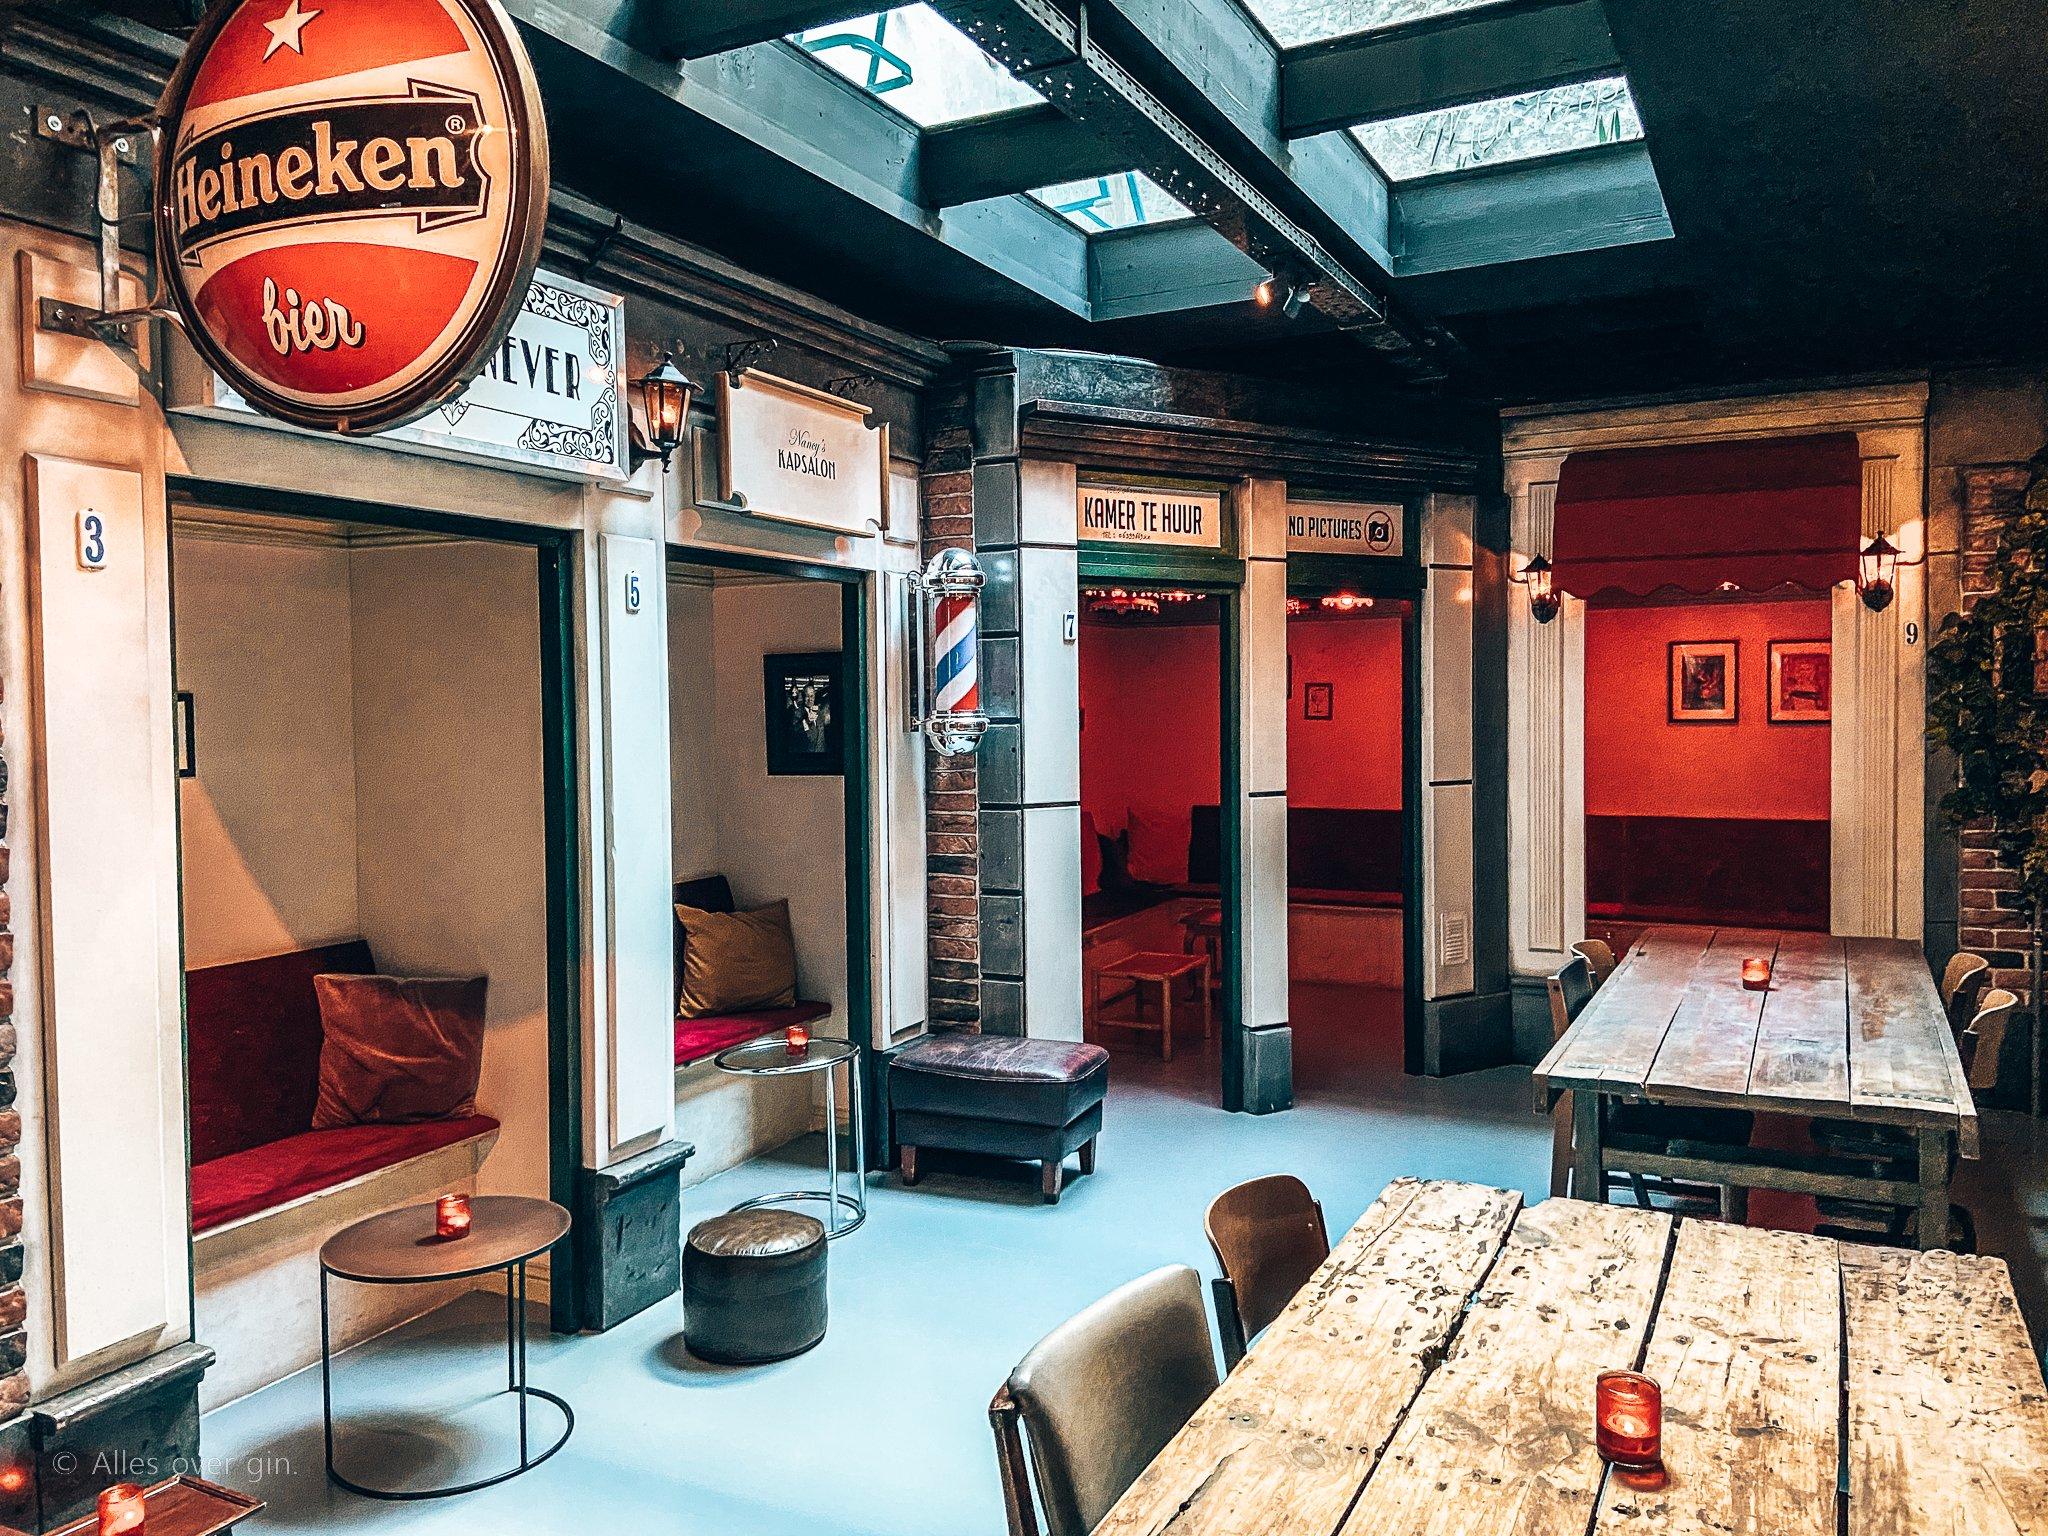 Cocktailbar Bar Mokum, De Wallen, Amsterdam, Alles over gin.